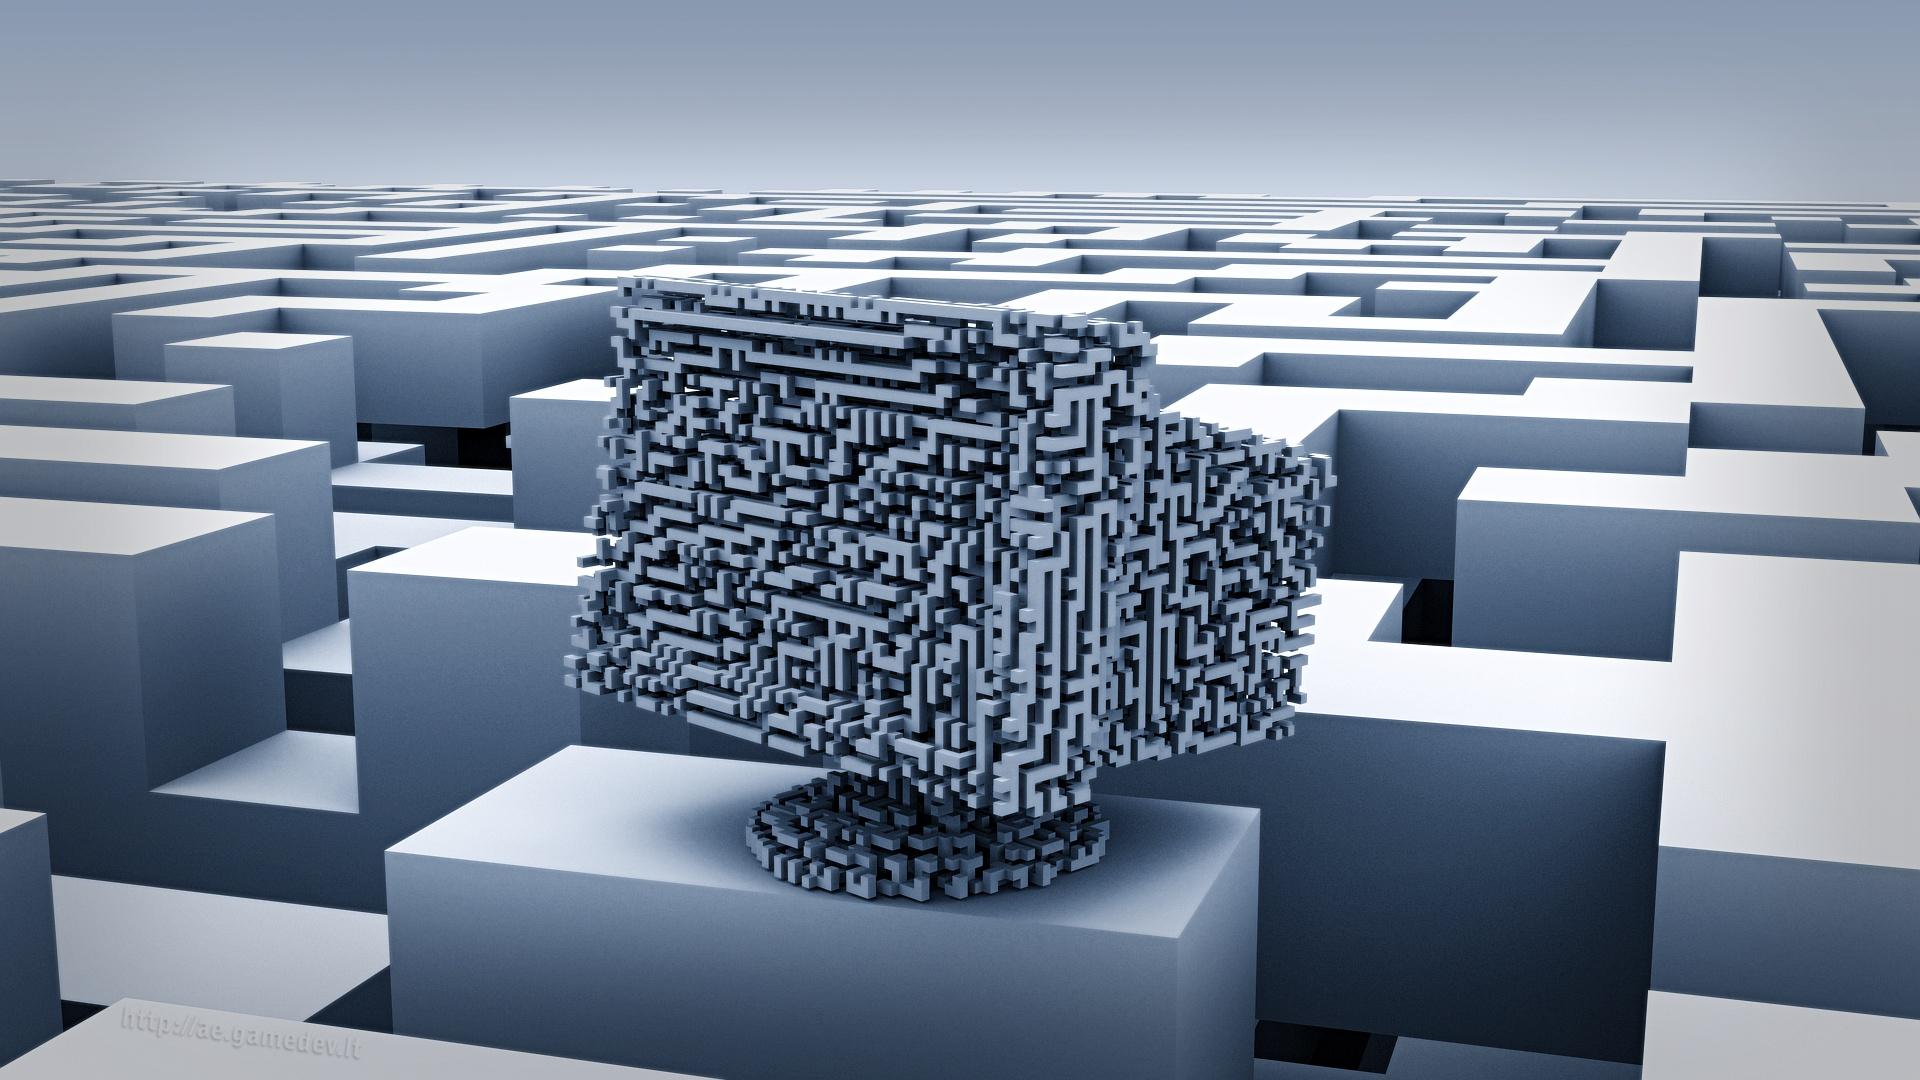 3D labyrinth - monitor